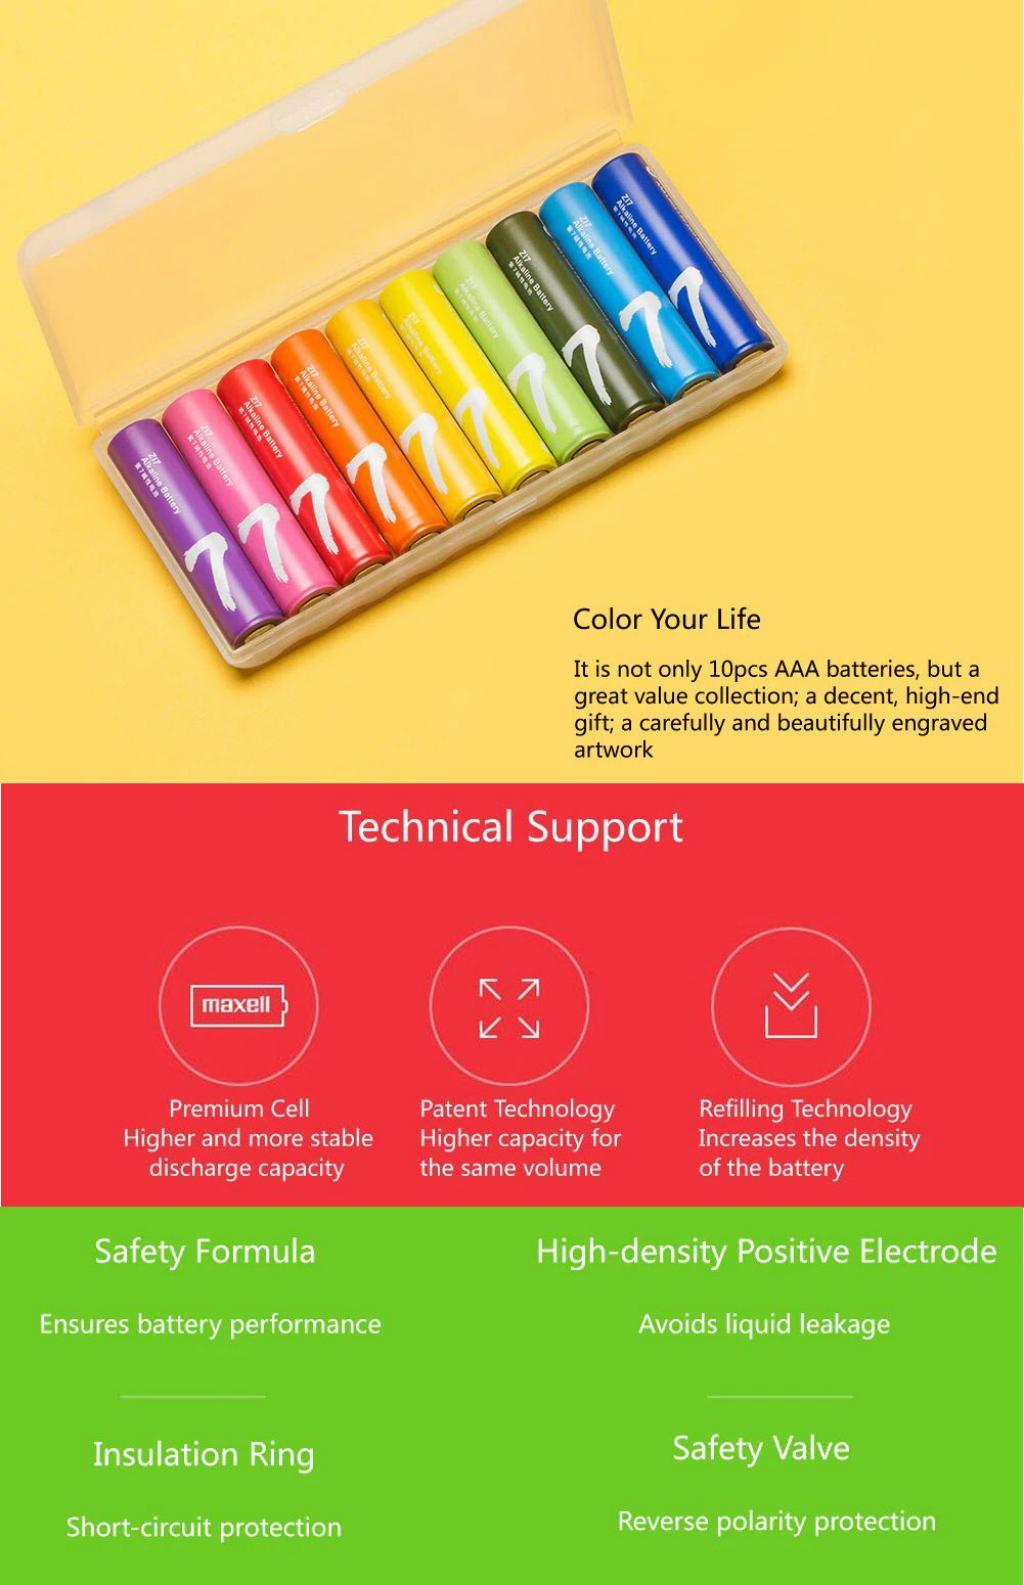 Xiaomi Zmi Rainbow Aaa Alkaline Battery Set 10 Pcs (3)